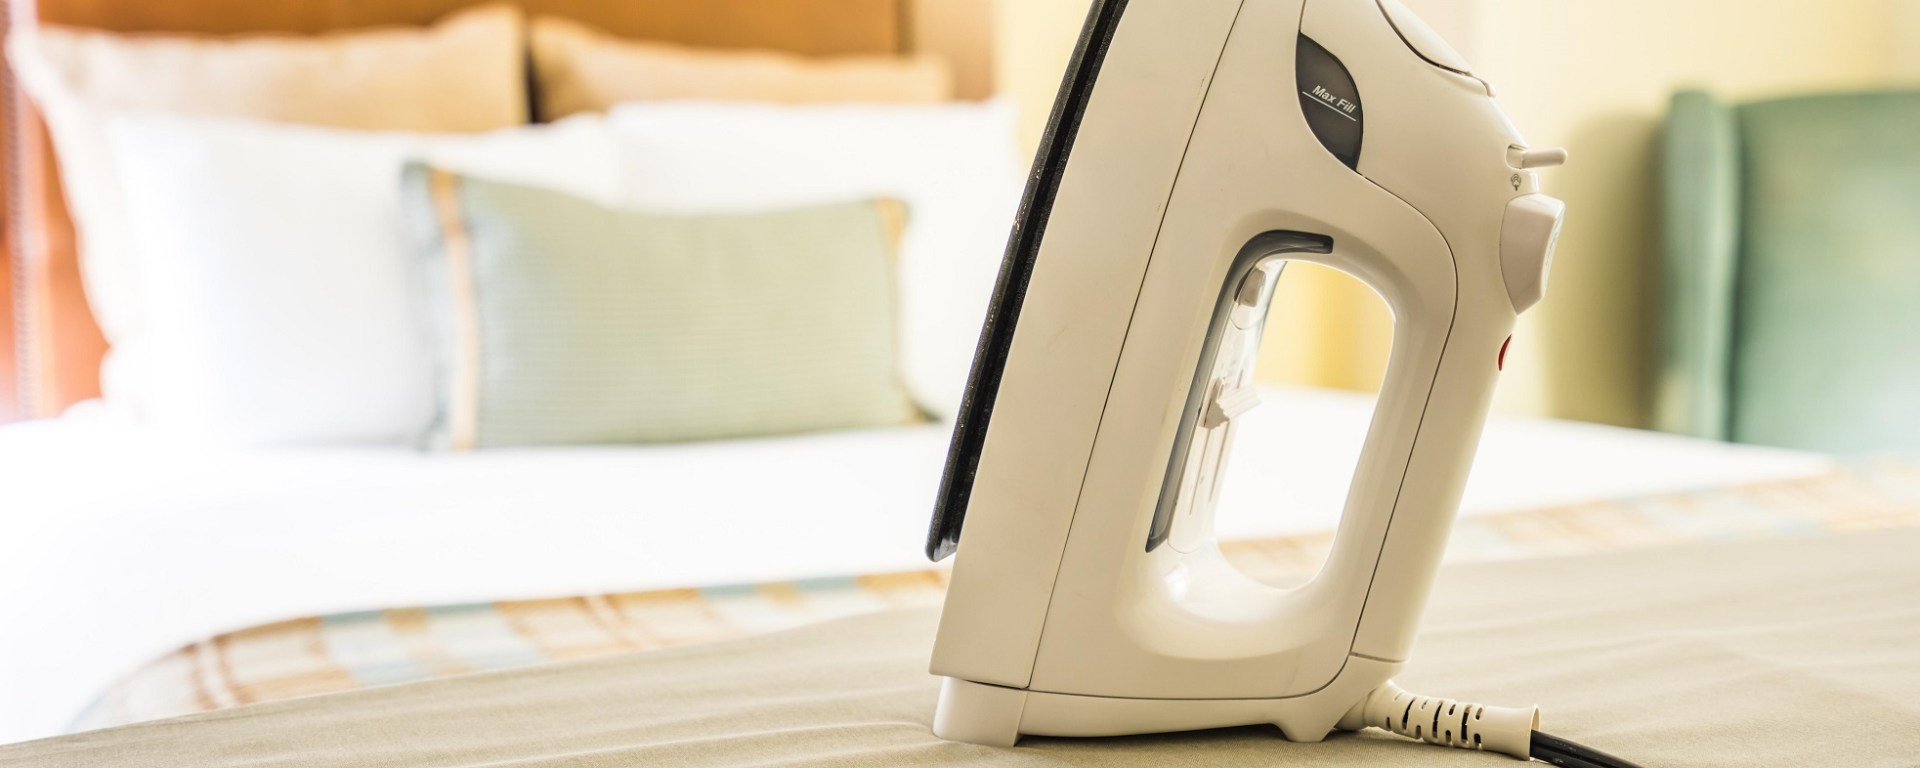 hotel iron and ironing board